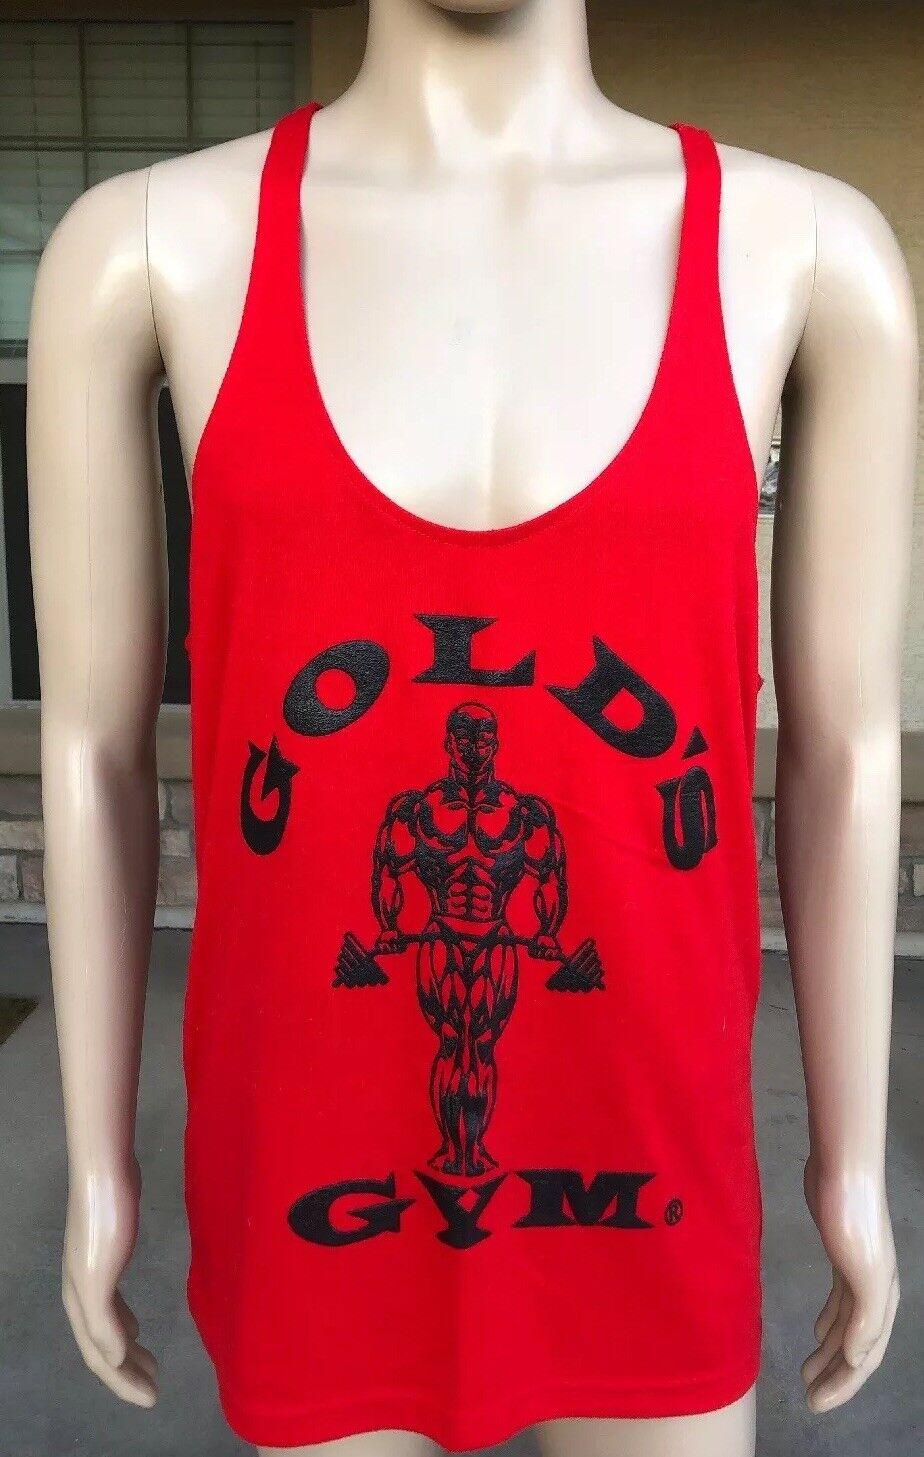 NWOT Vintage gold's Gym Arnold blackenegger Muscle Bodybuilding Tank Top Large